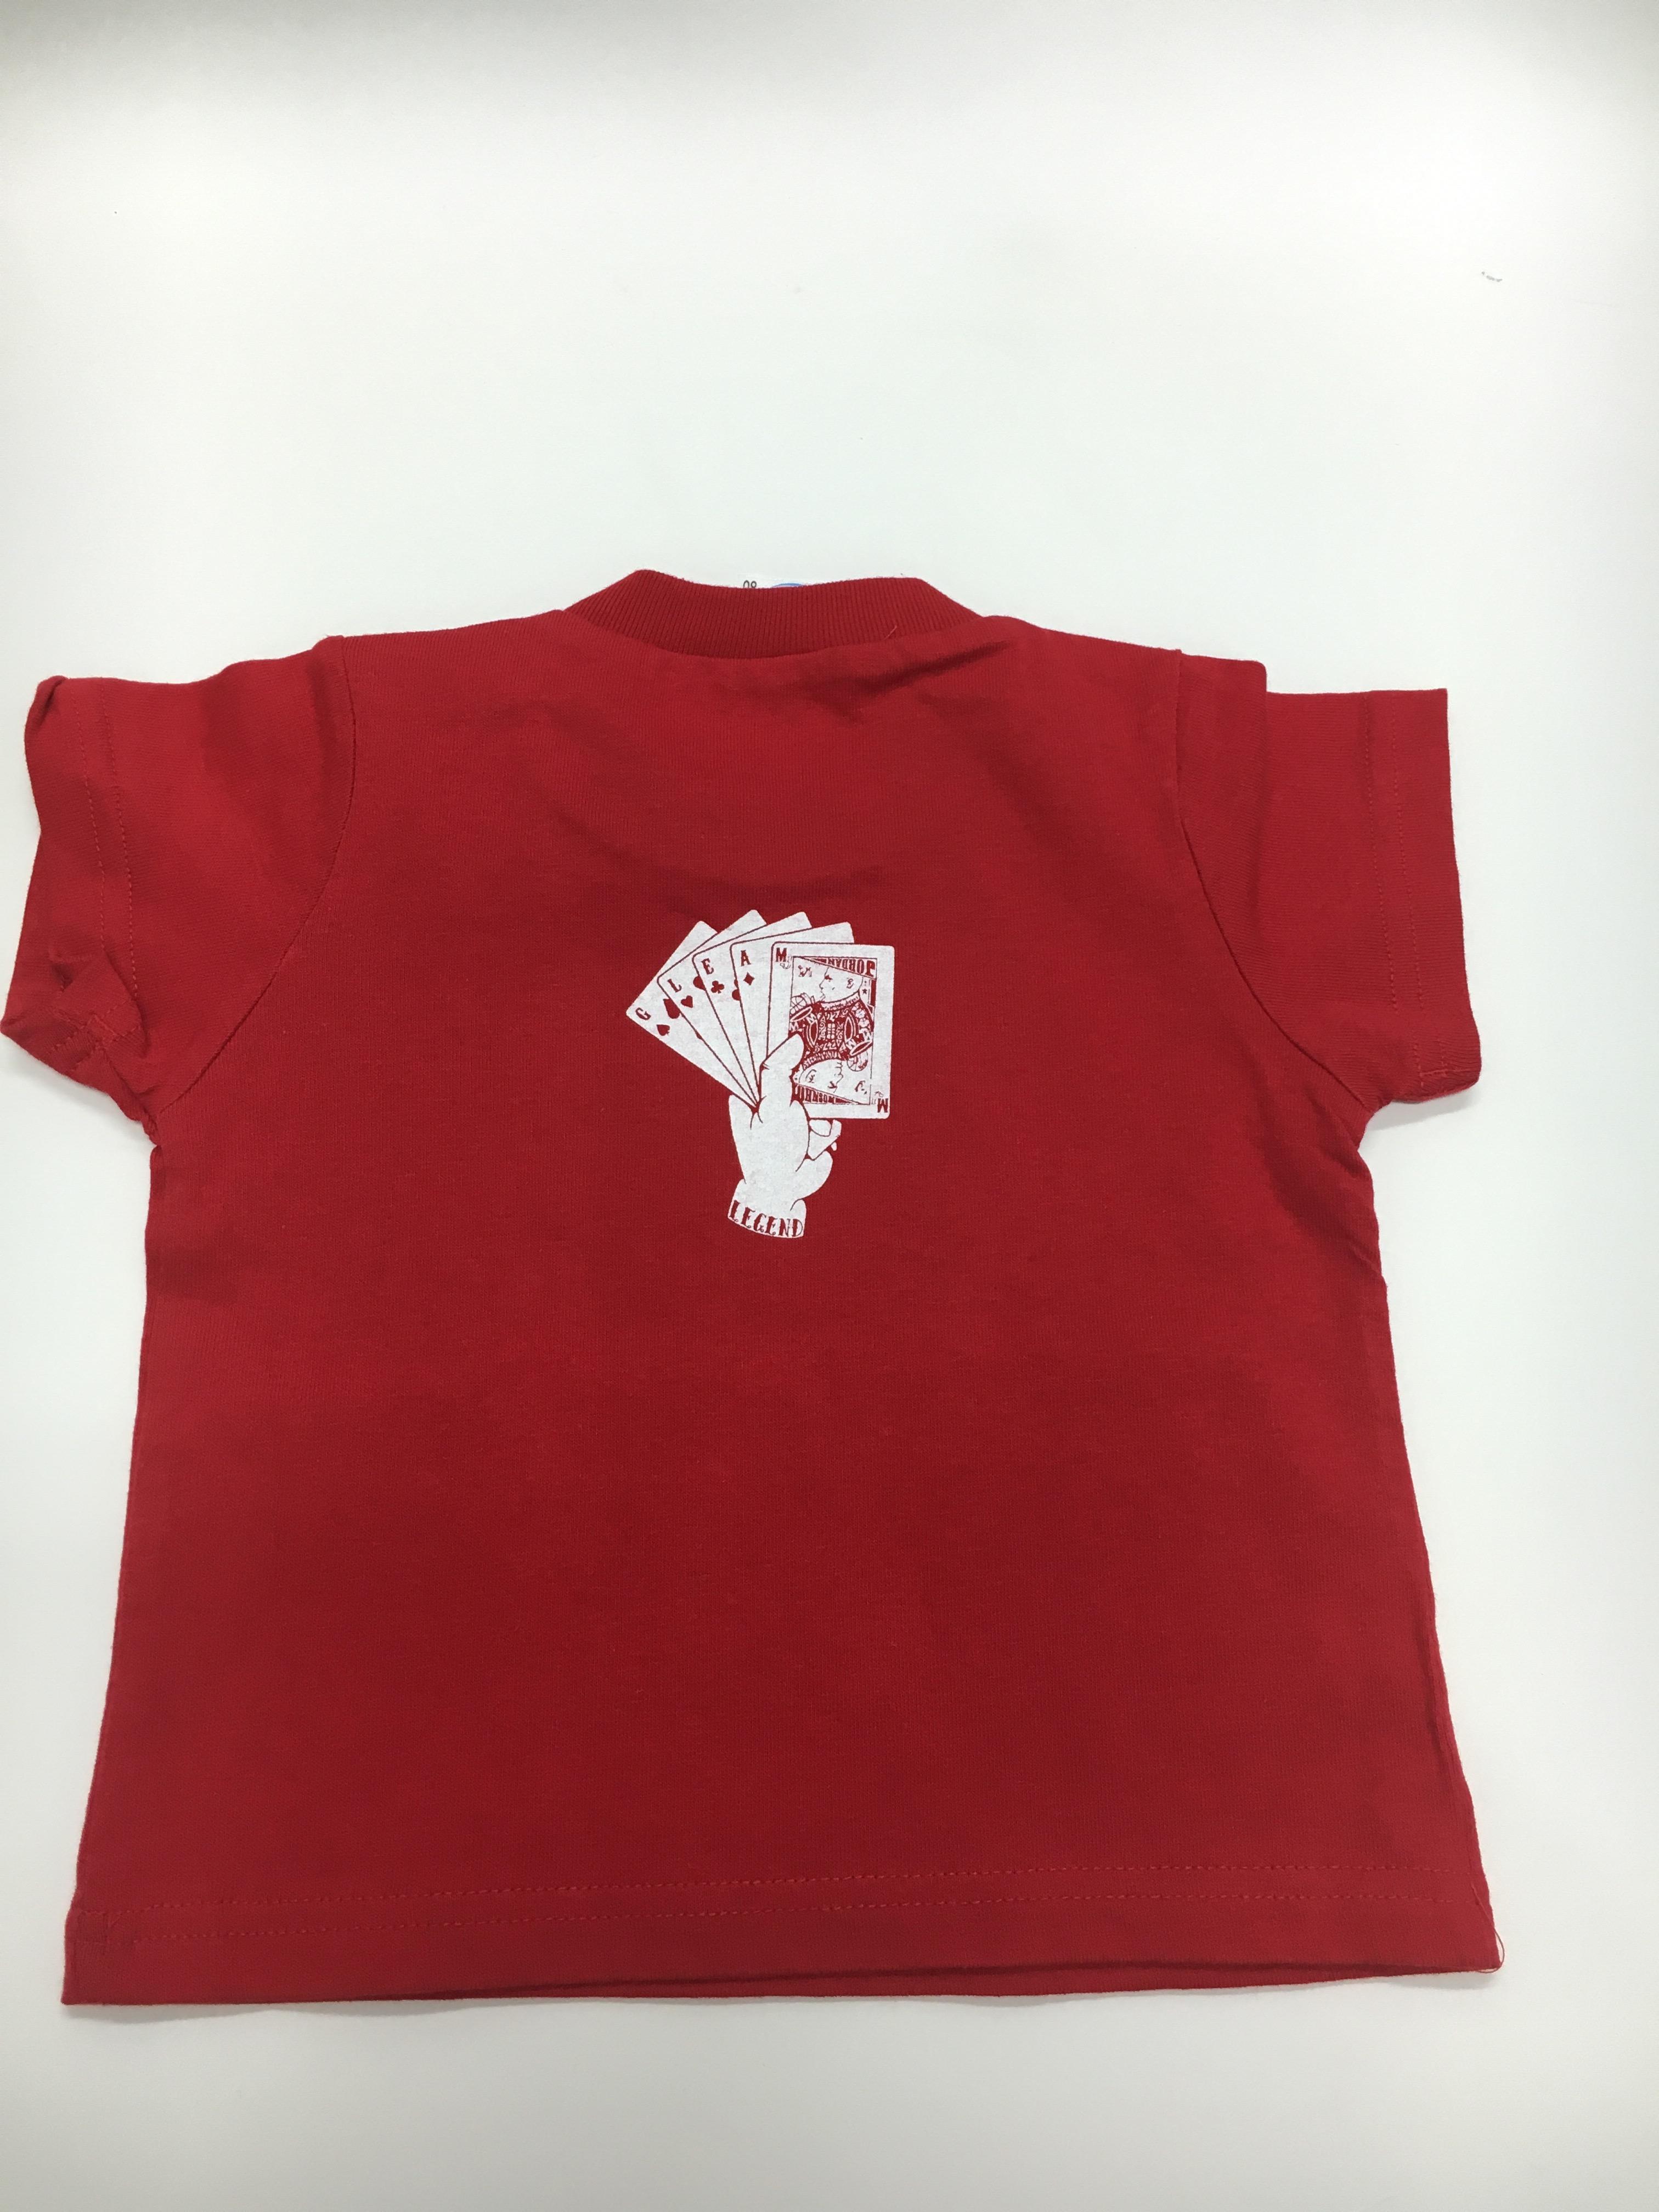 LOCKER GLEAM TSHIRTS KIDS